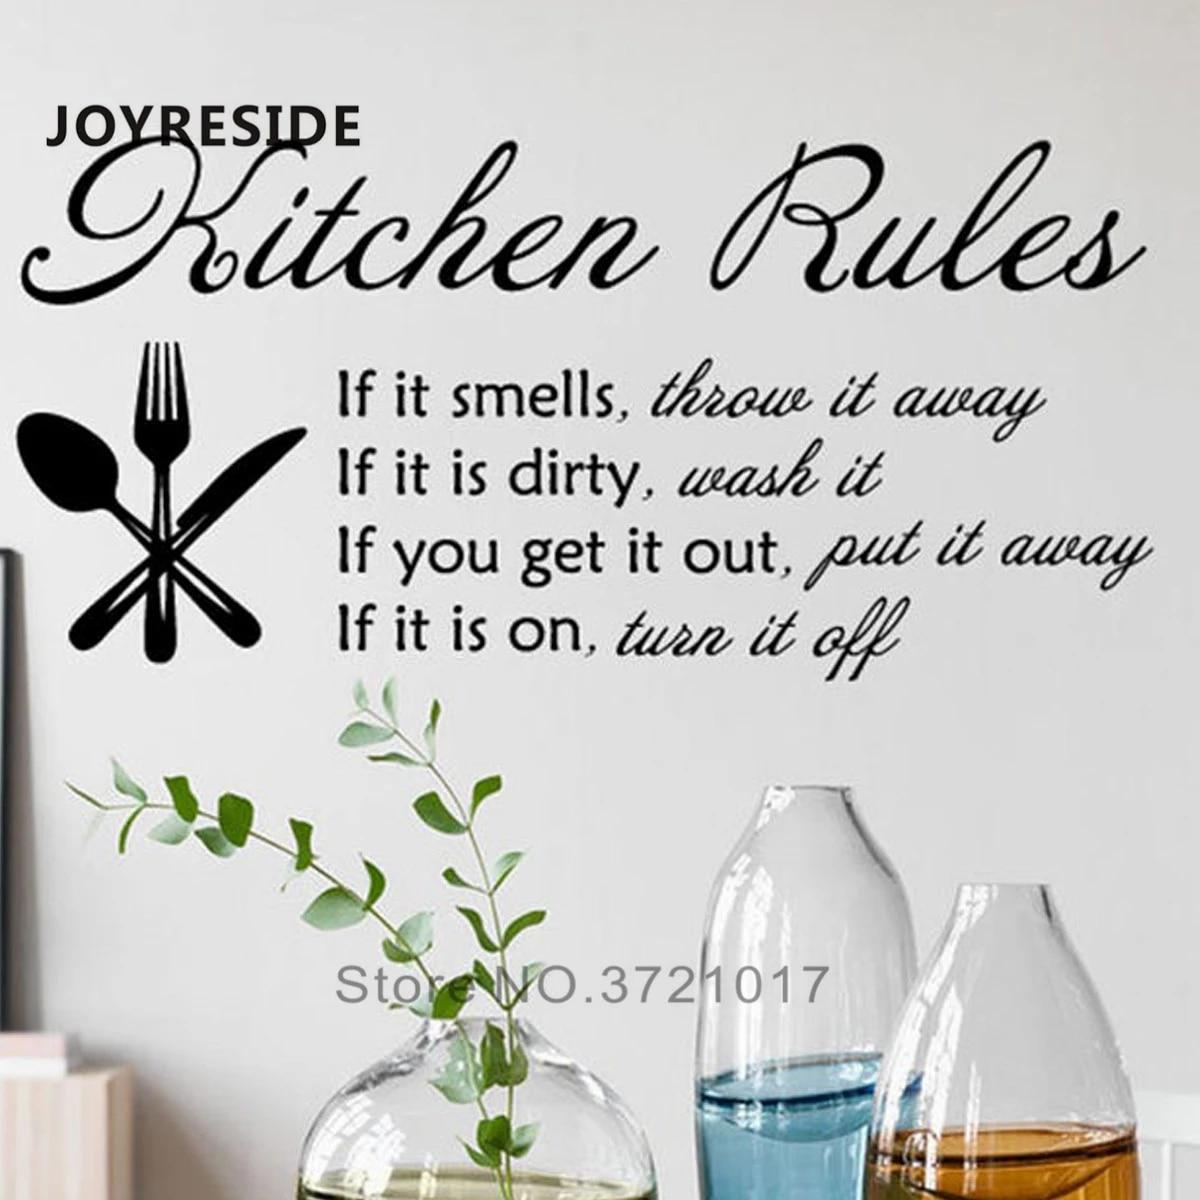 Kitchen Rules Wall Decor Decals Home Sticker House Decoration Murals If Smells Throw It Away Vinyl Design M388 Stickers Aliexpress